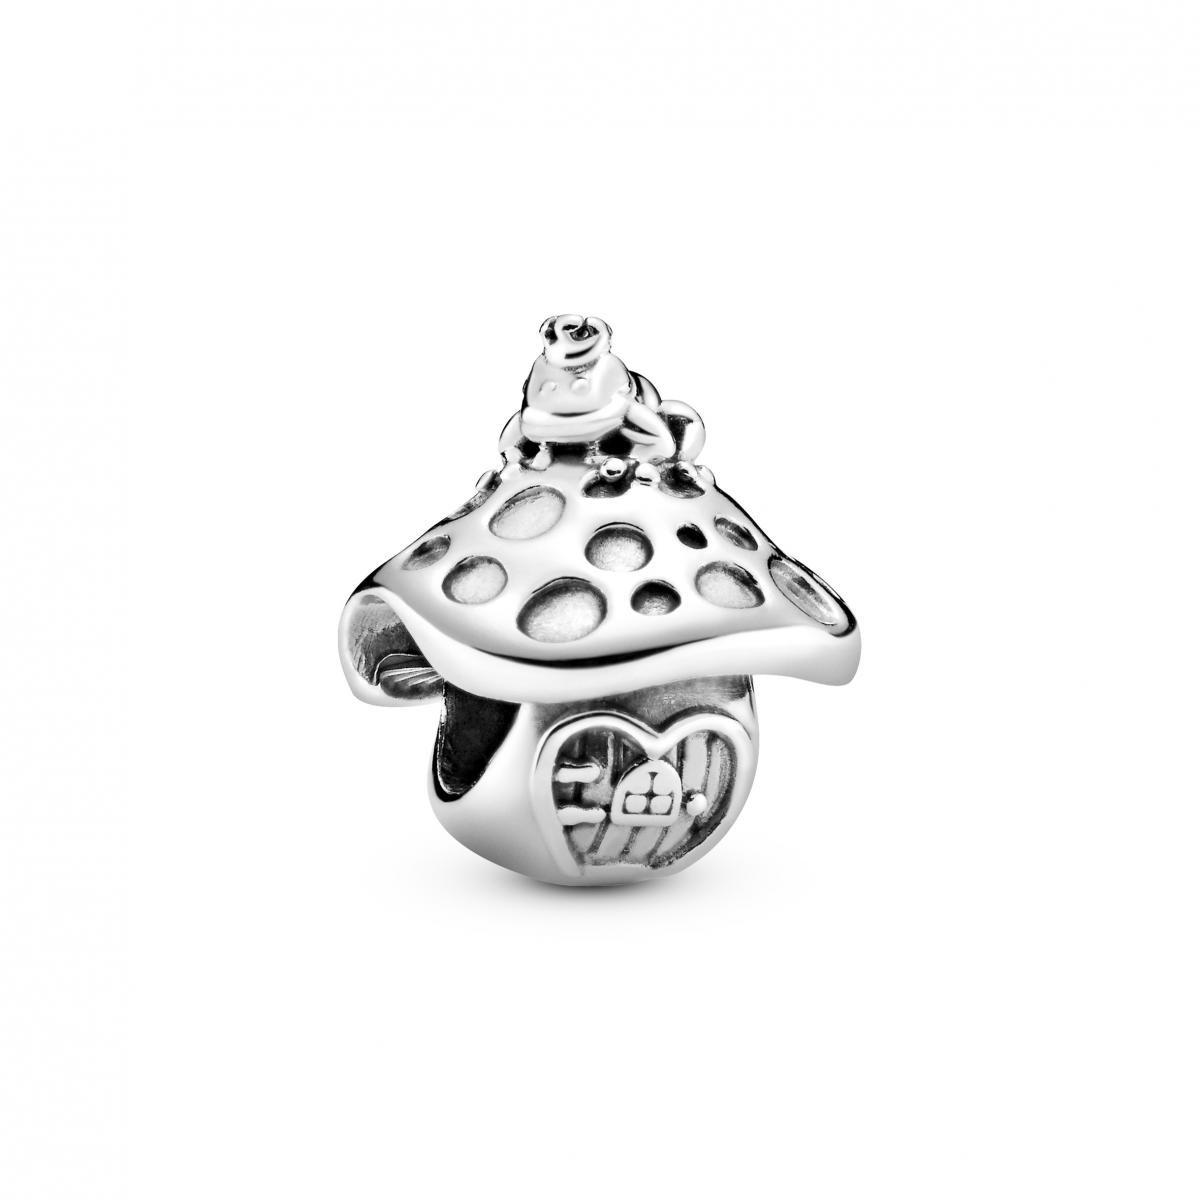 bijoux charms pandora homme